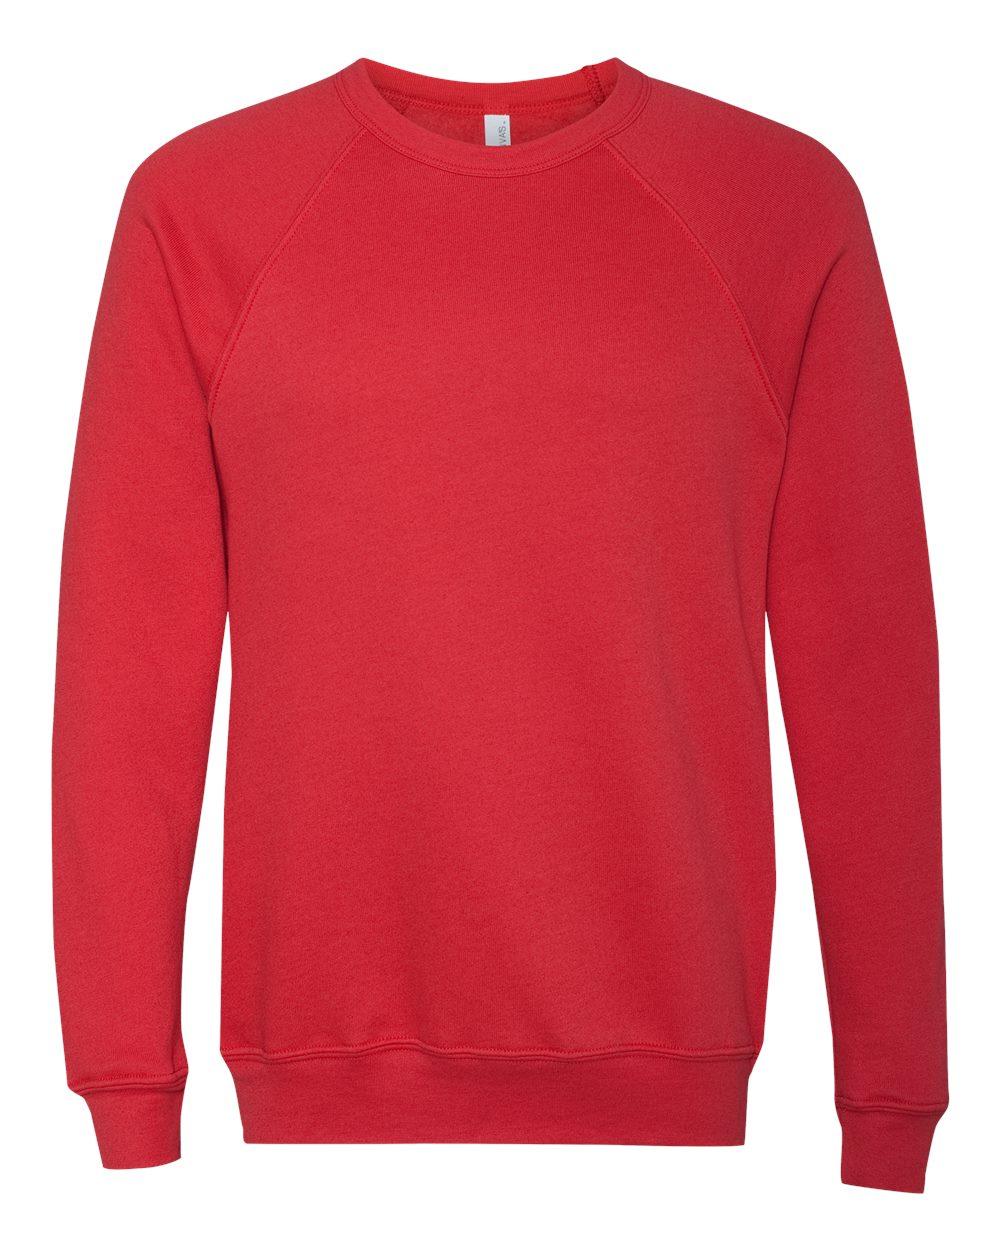 Bella-Canvas-Unisex-Sponge-Fleece-Crewneck-Sweatshirt-Top-Blank-3901-up-to-2XL thumbnail 60